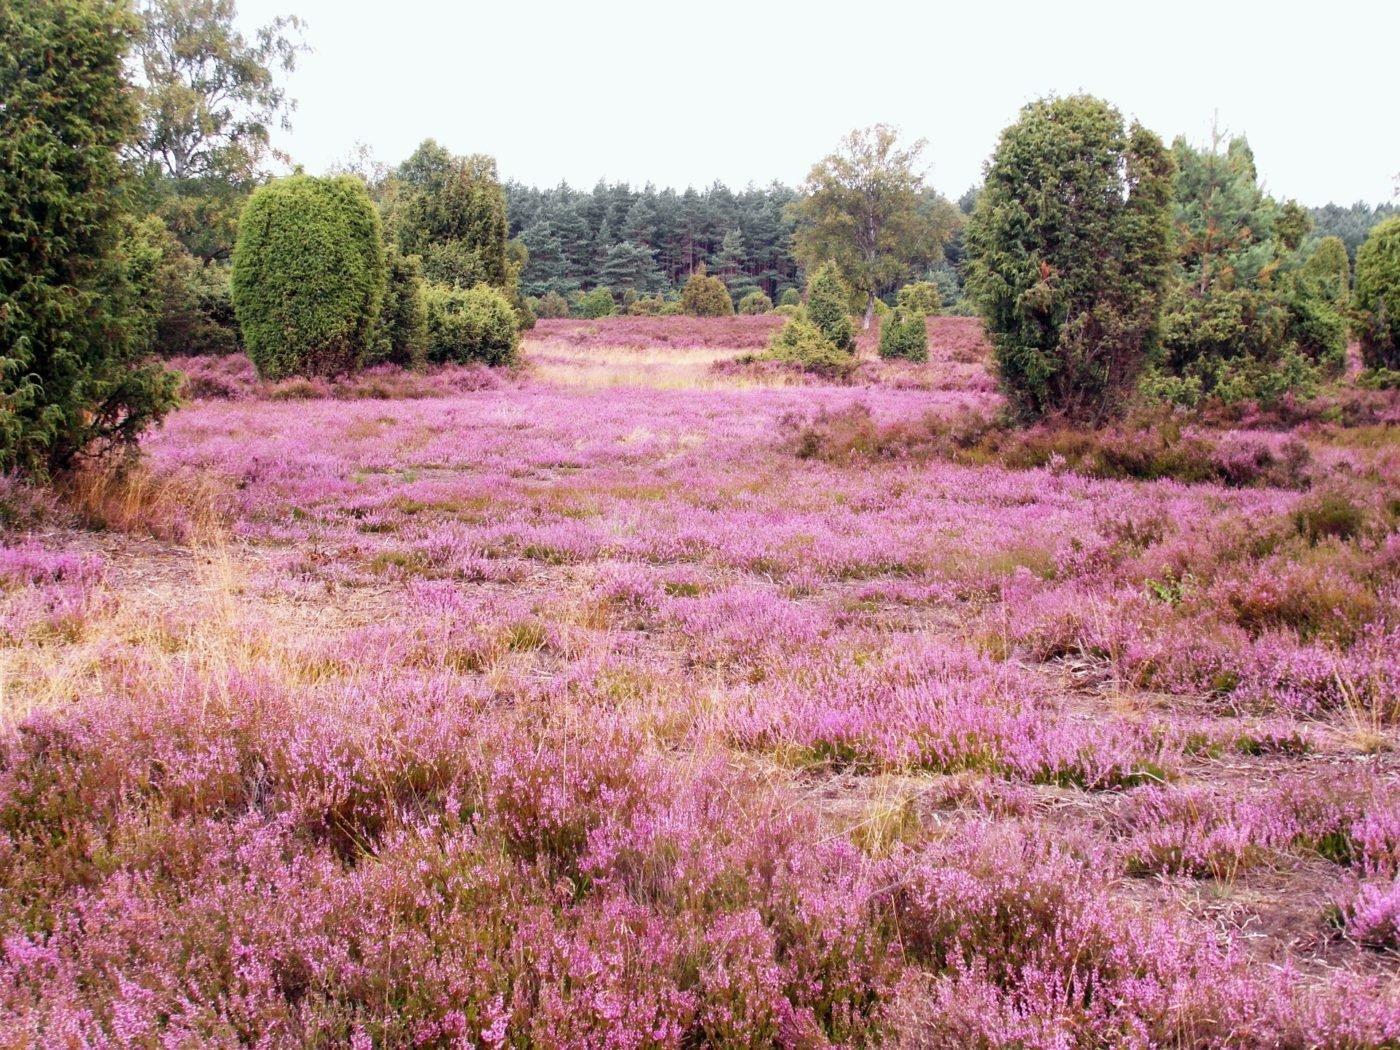 In der Lüneburger Heide gibt es viel Lavendel